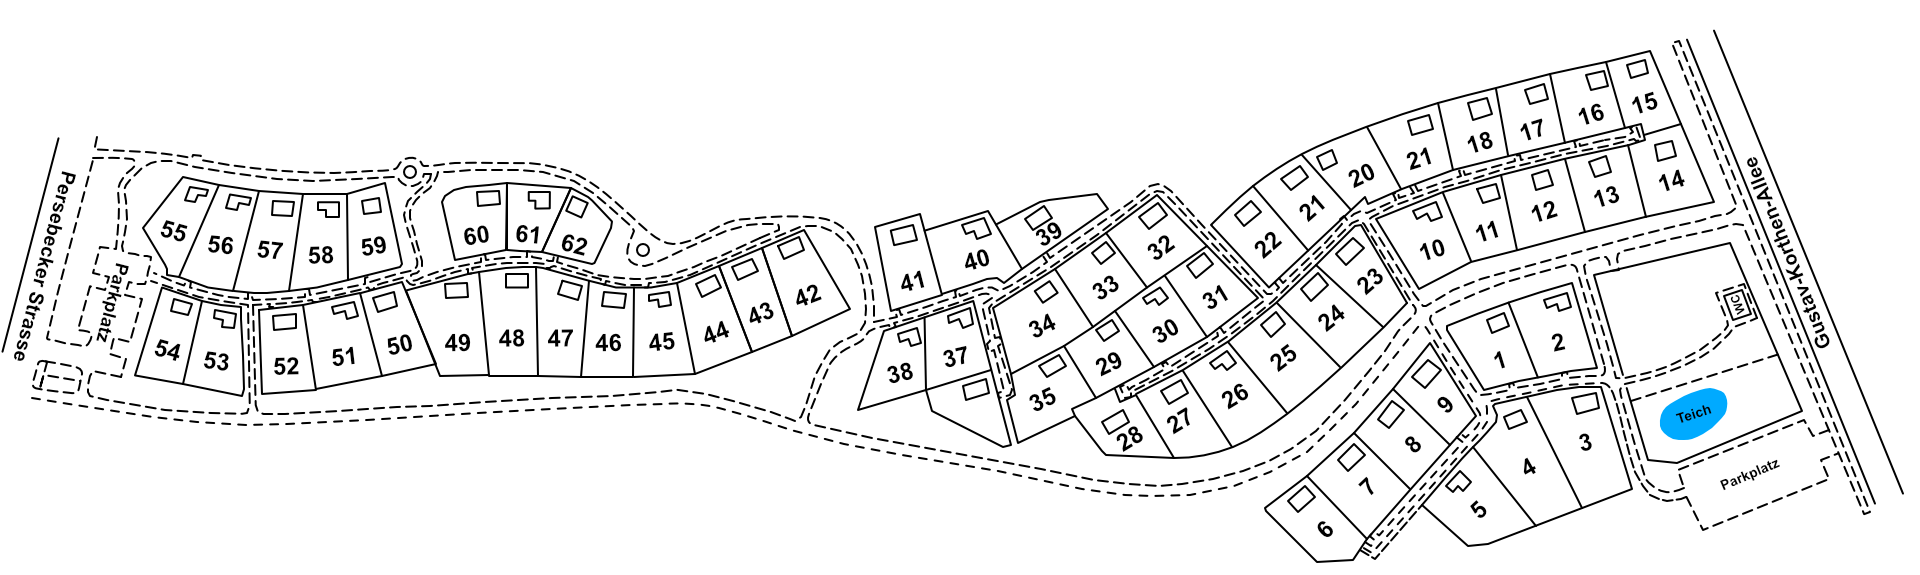 Lageplan des Gartenvereins Fritz Husemann e.V.